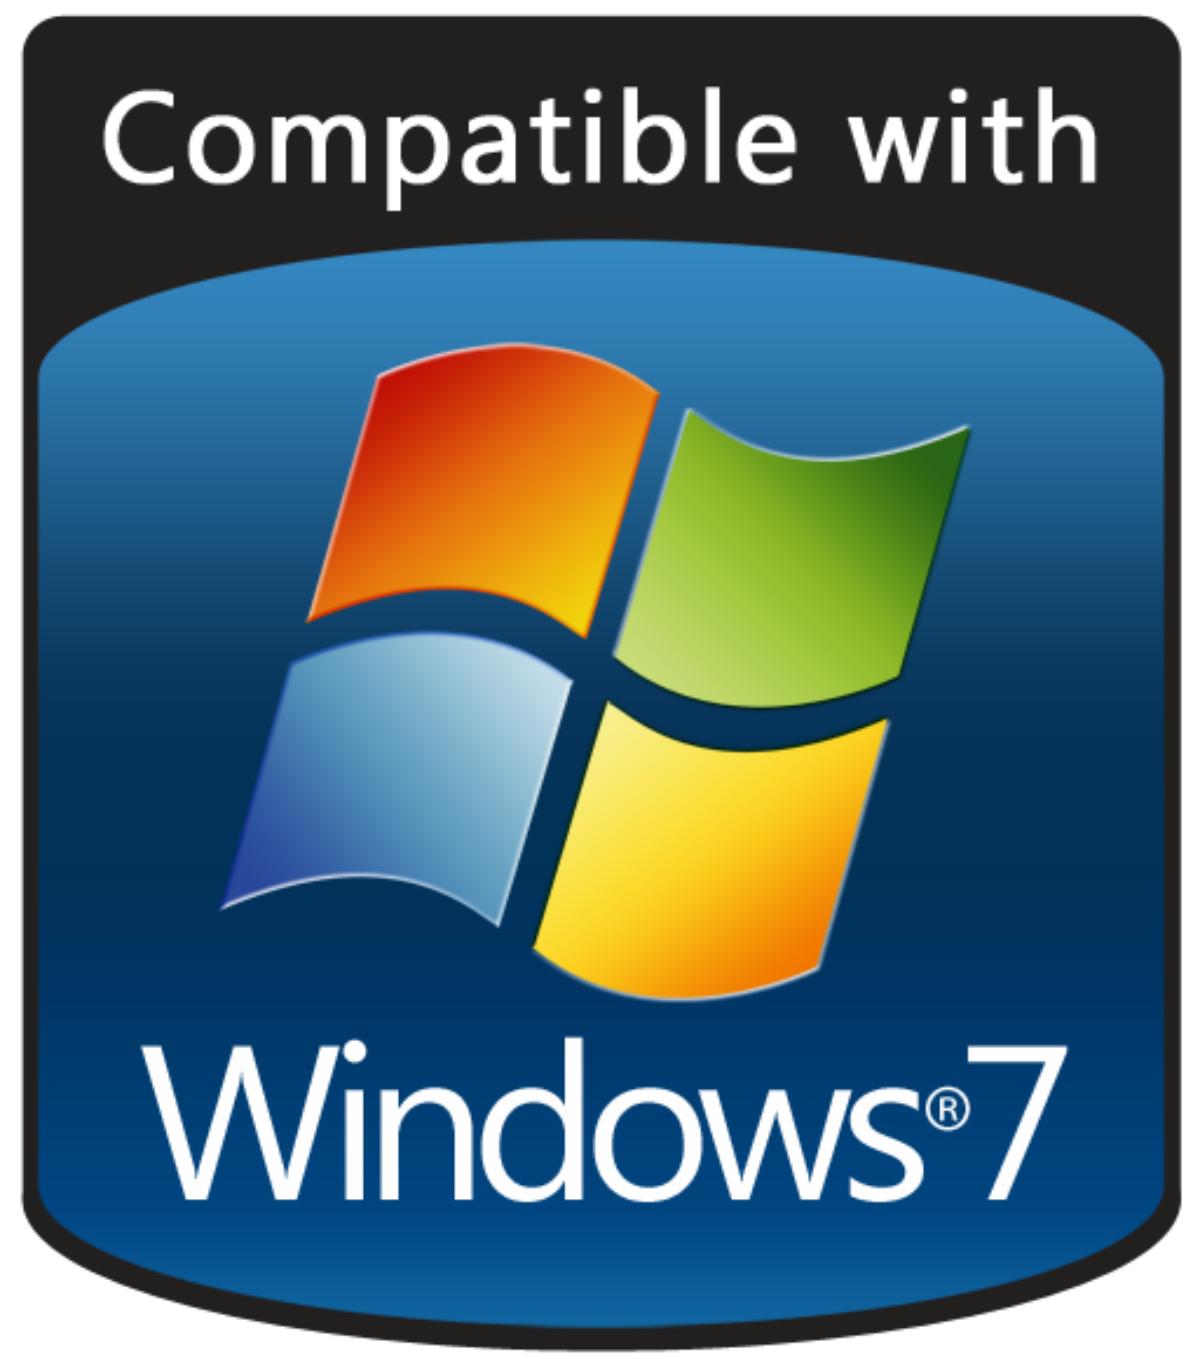 windows_7_capable_logo_vector_by_janek2012.png